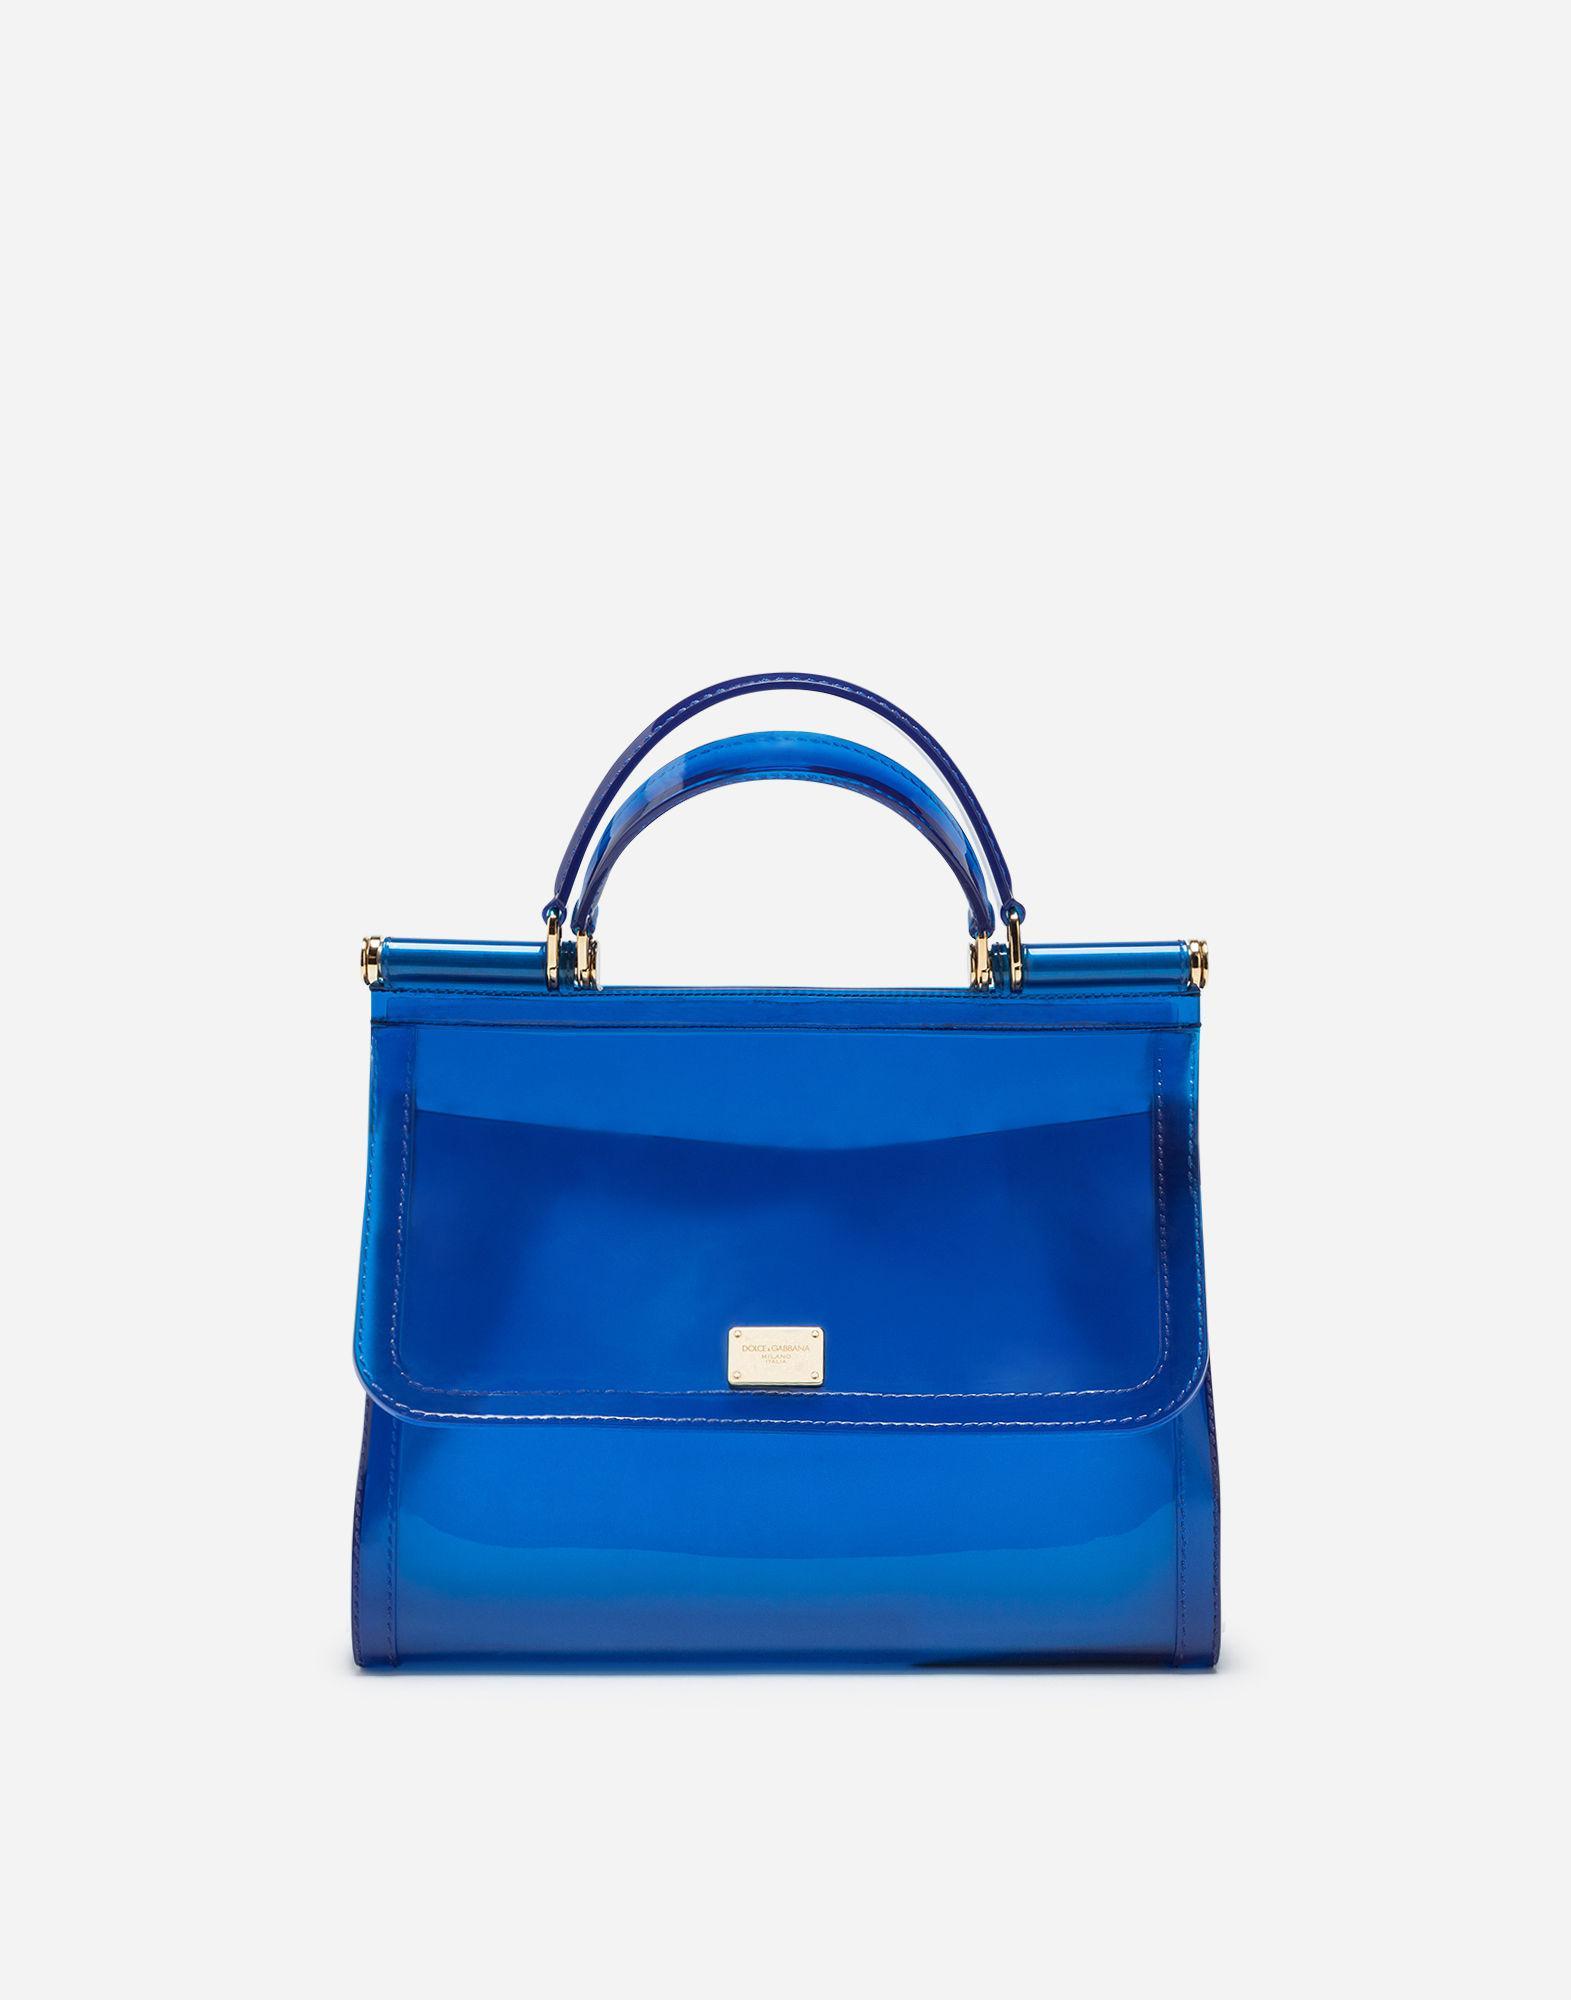 a450f83858 Lyst - Dolce   Gabbana Semi-transparent Rubber Sicily Handbag in Blue